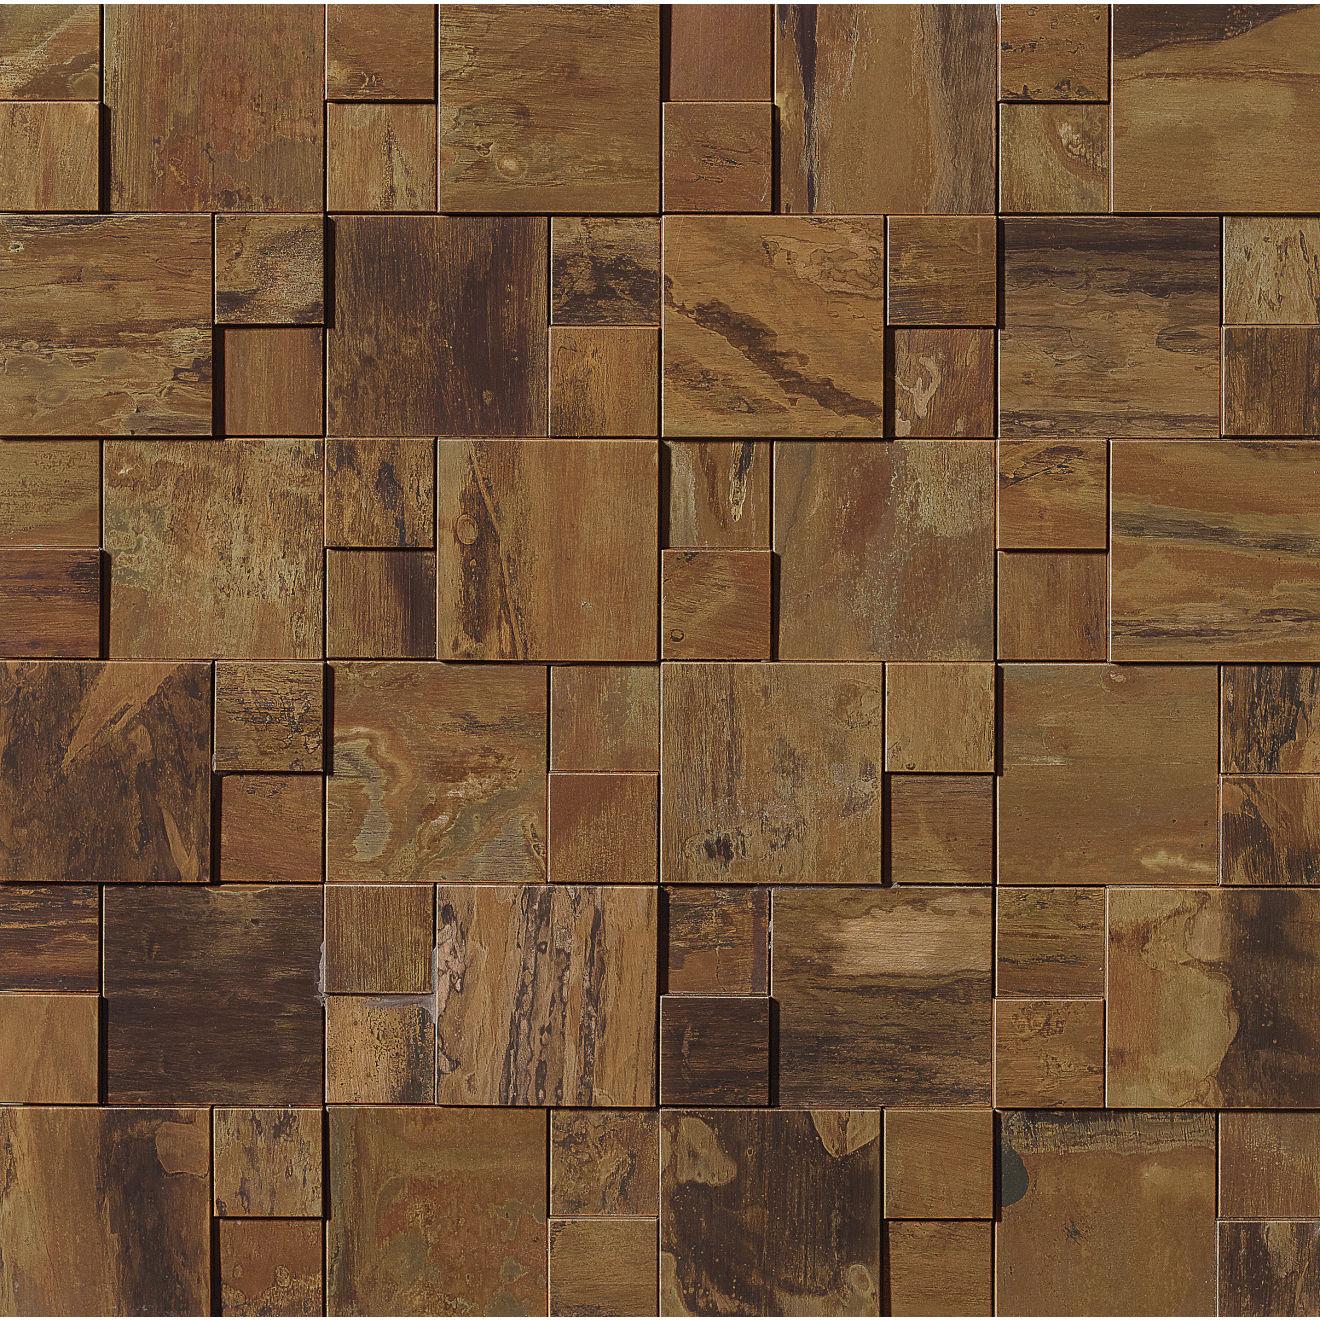 "Acadia 11"" x 11"" Decorative Tile in Islesford Copper"